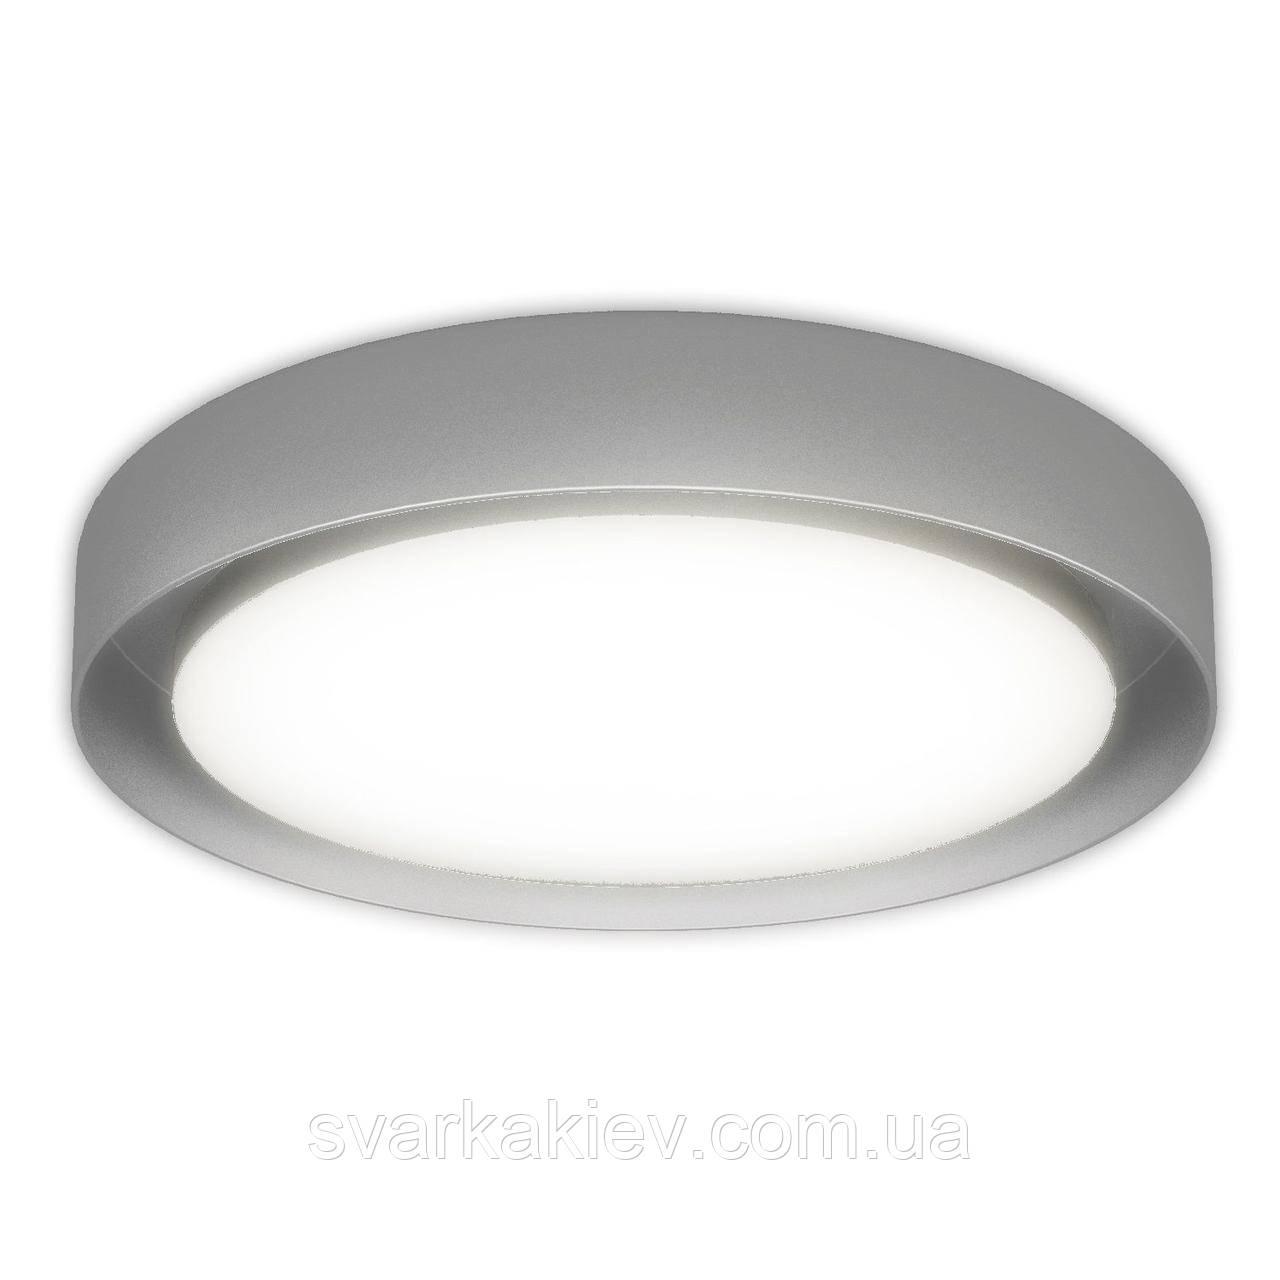 Декоративная накладка Ring for Ceiling lamp Cenova 18W S GR